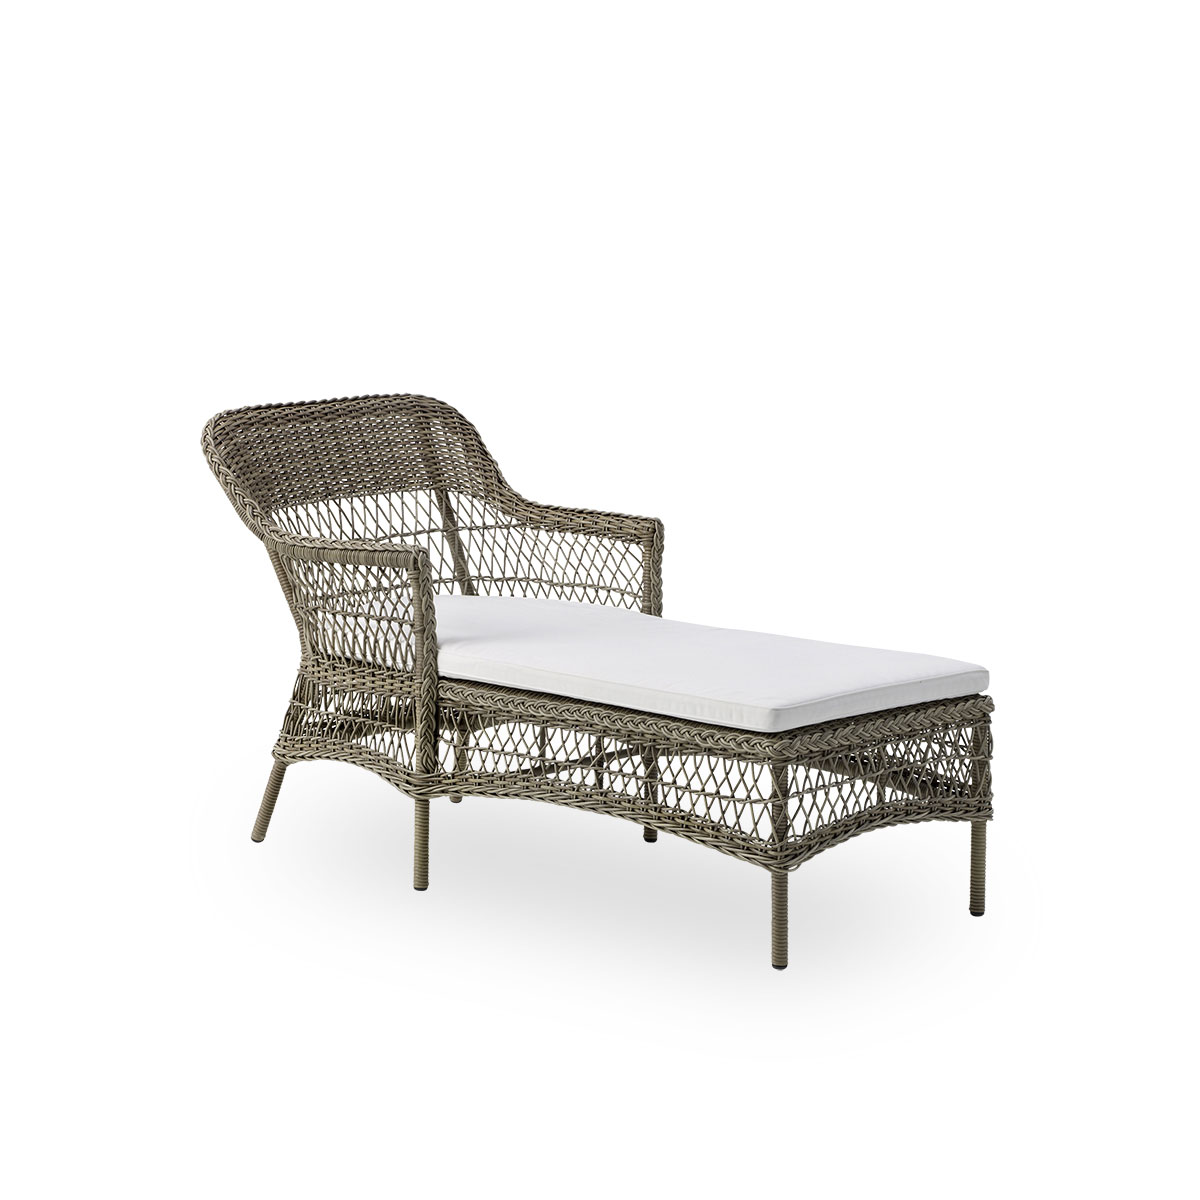 Sika Design Gartenliege 9590T Antik Grau